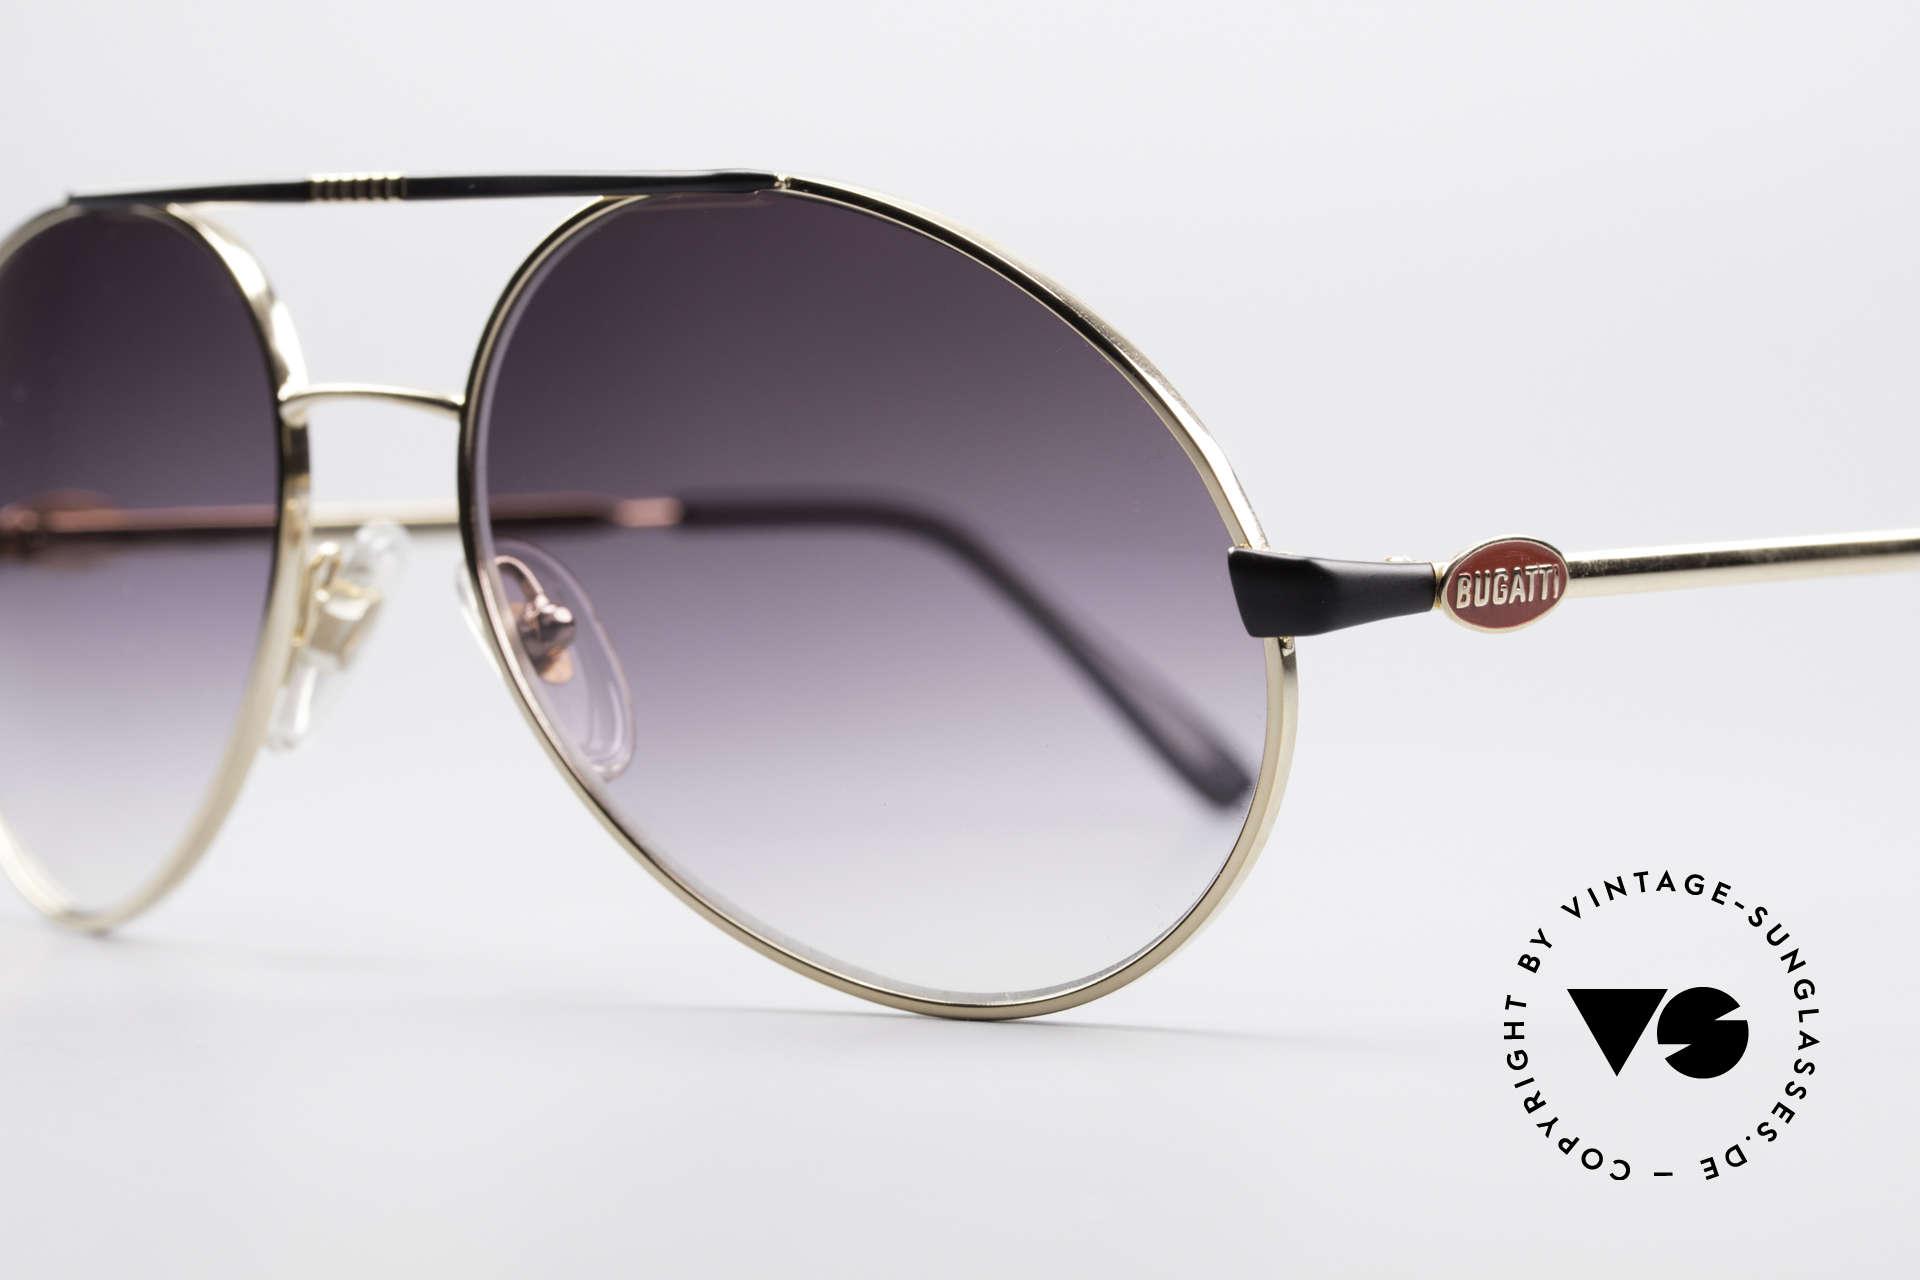 Bugatti 65837 80's Designer Sunglasses, materials (100% UV prot.) & workmanship on top level, Made for Men